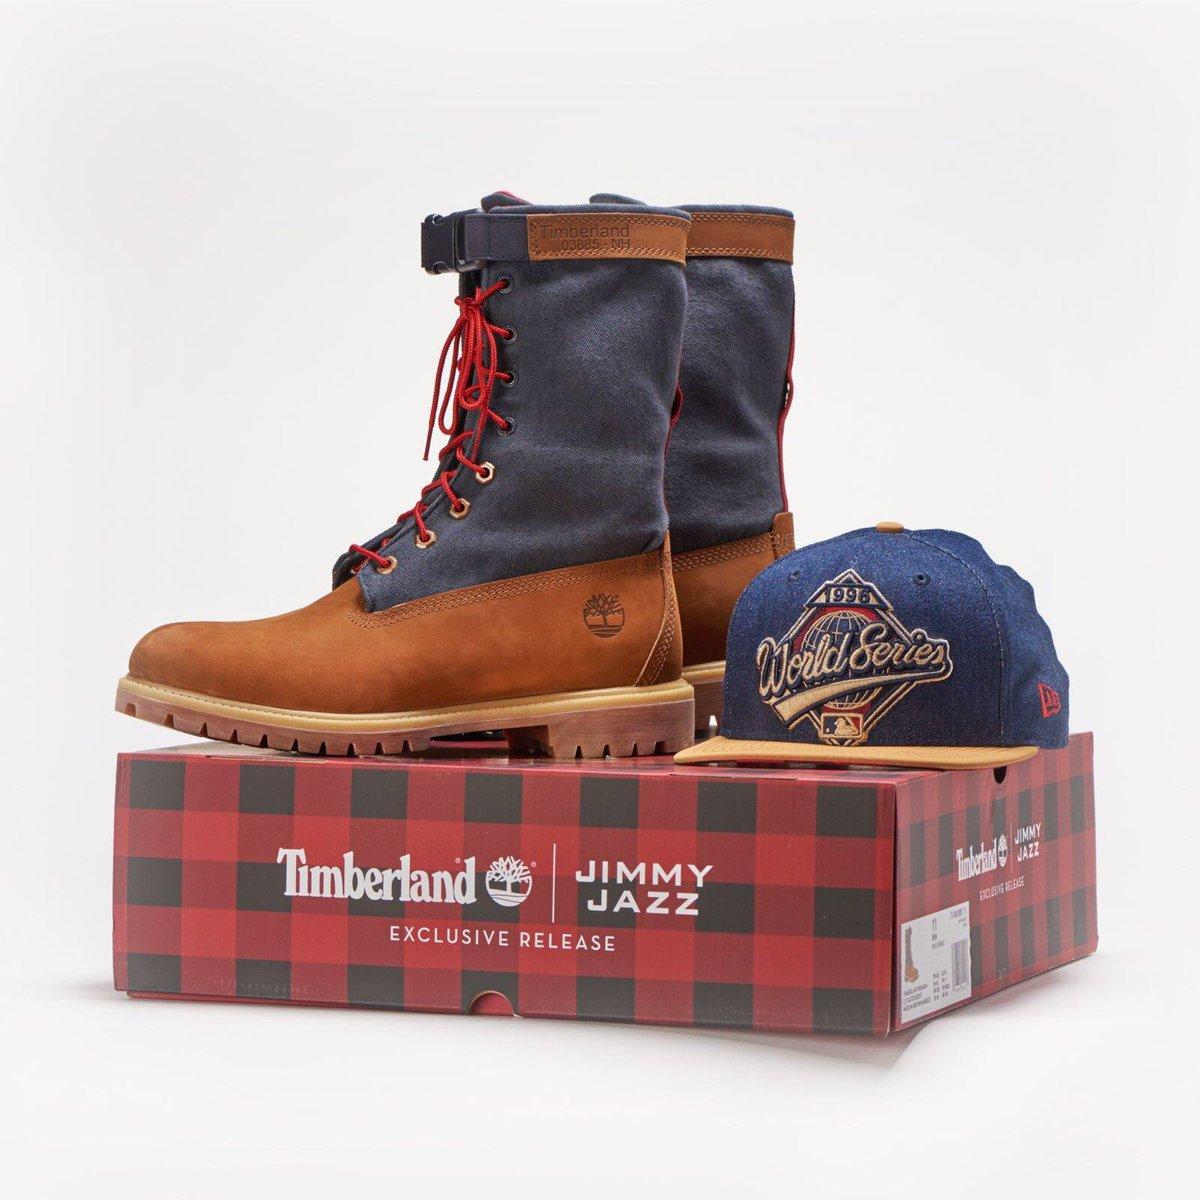 Jimmy Jazz On Twitter The At Timberland 6 Inch Premium Gaiter Boot